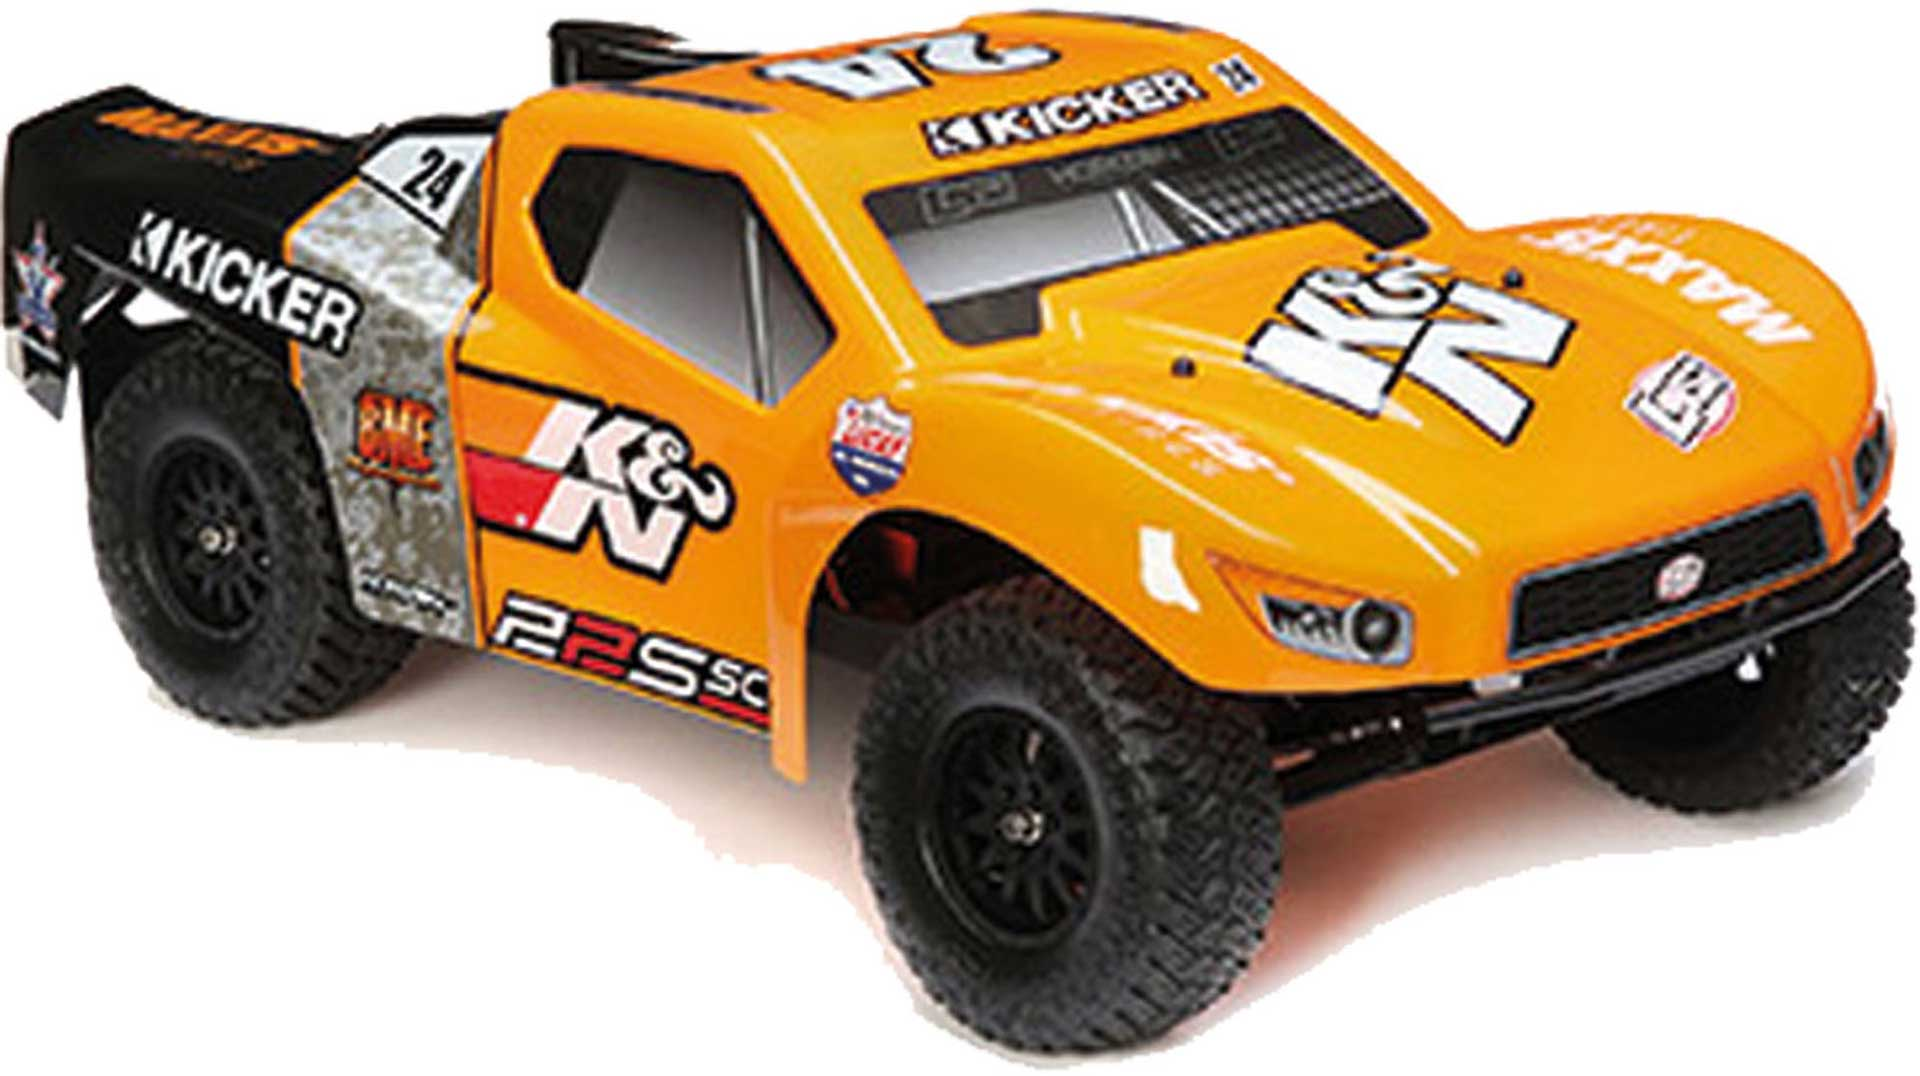 LOSI 22 SCT RTR 1/10 2WD AVC K&N